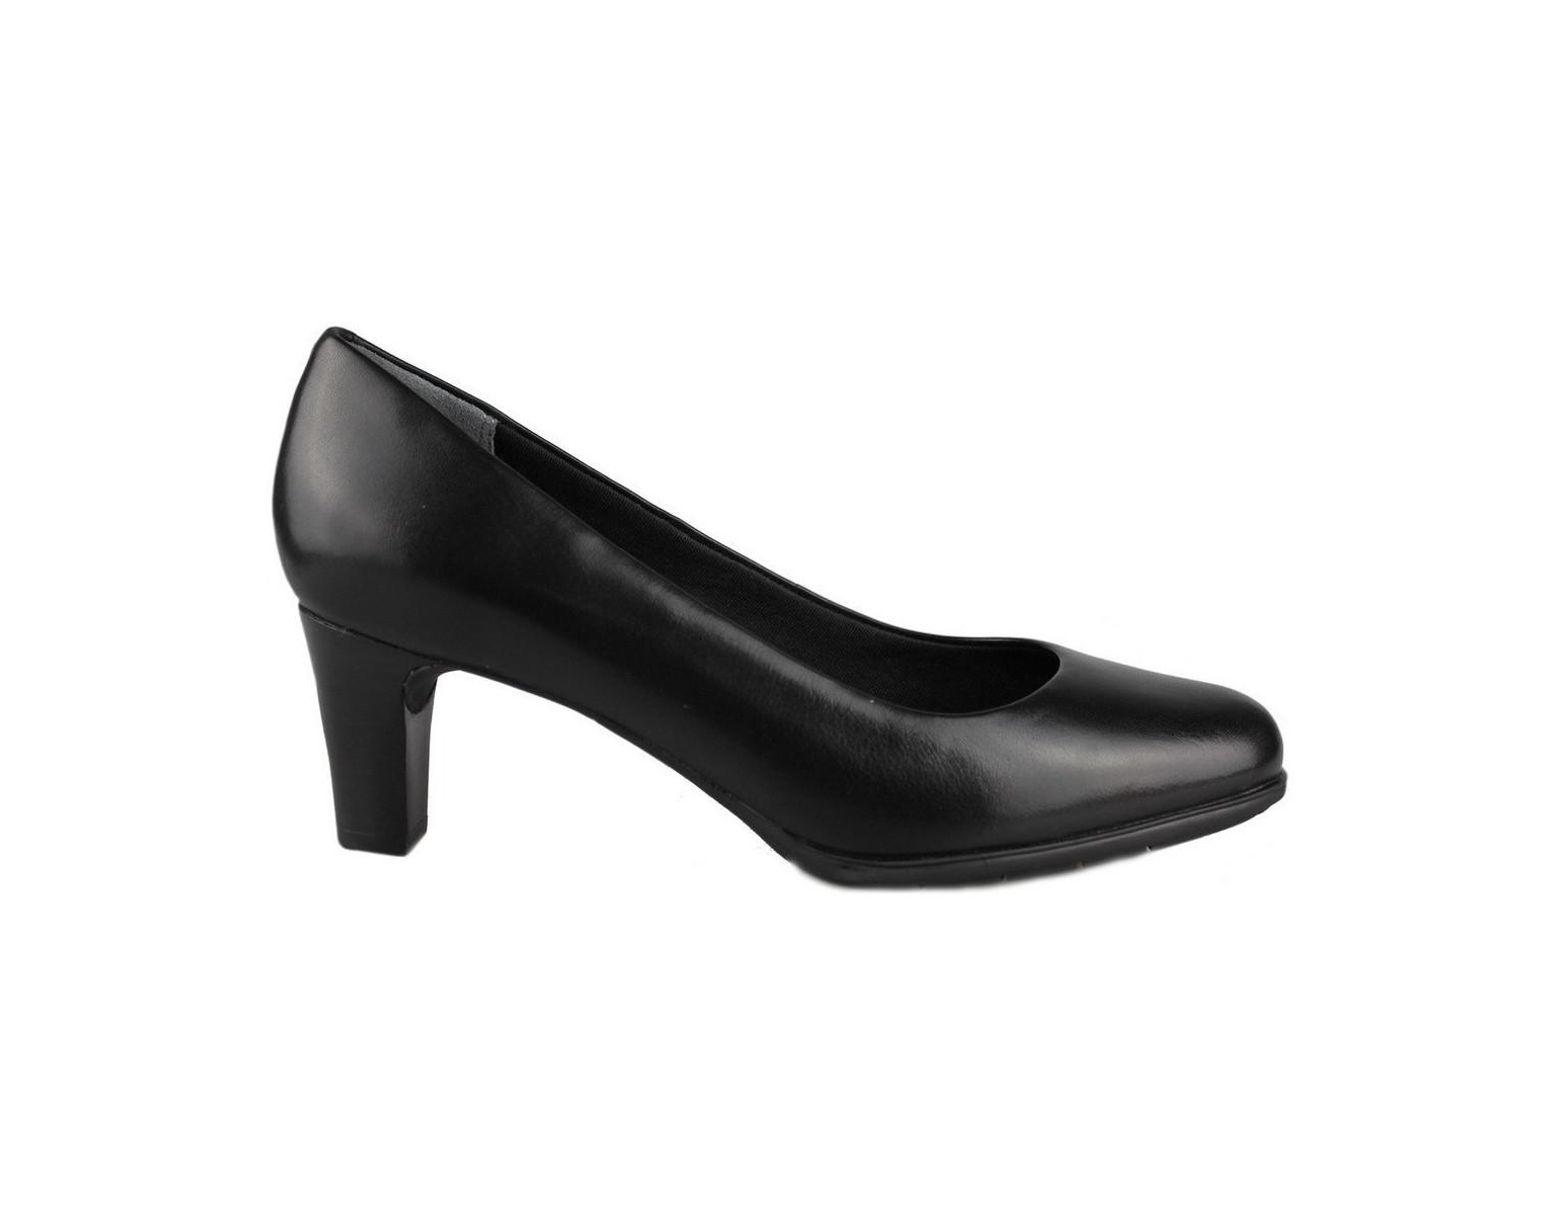 827711d58b0 Ally Plain Pump W Women's Court Shoes In Black